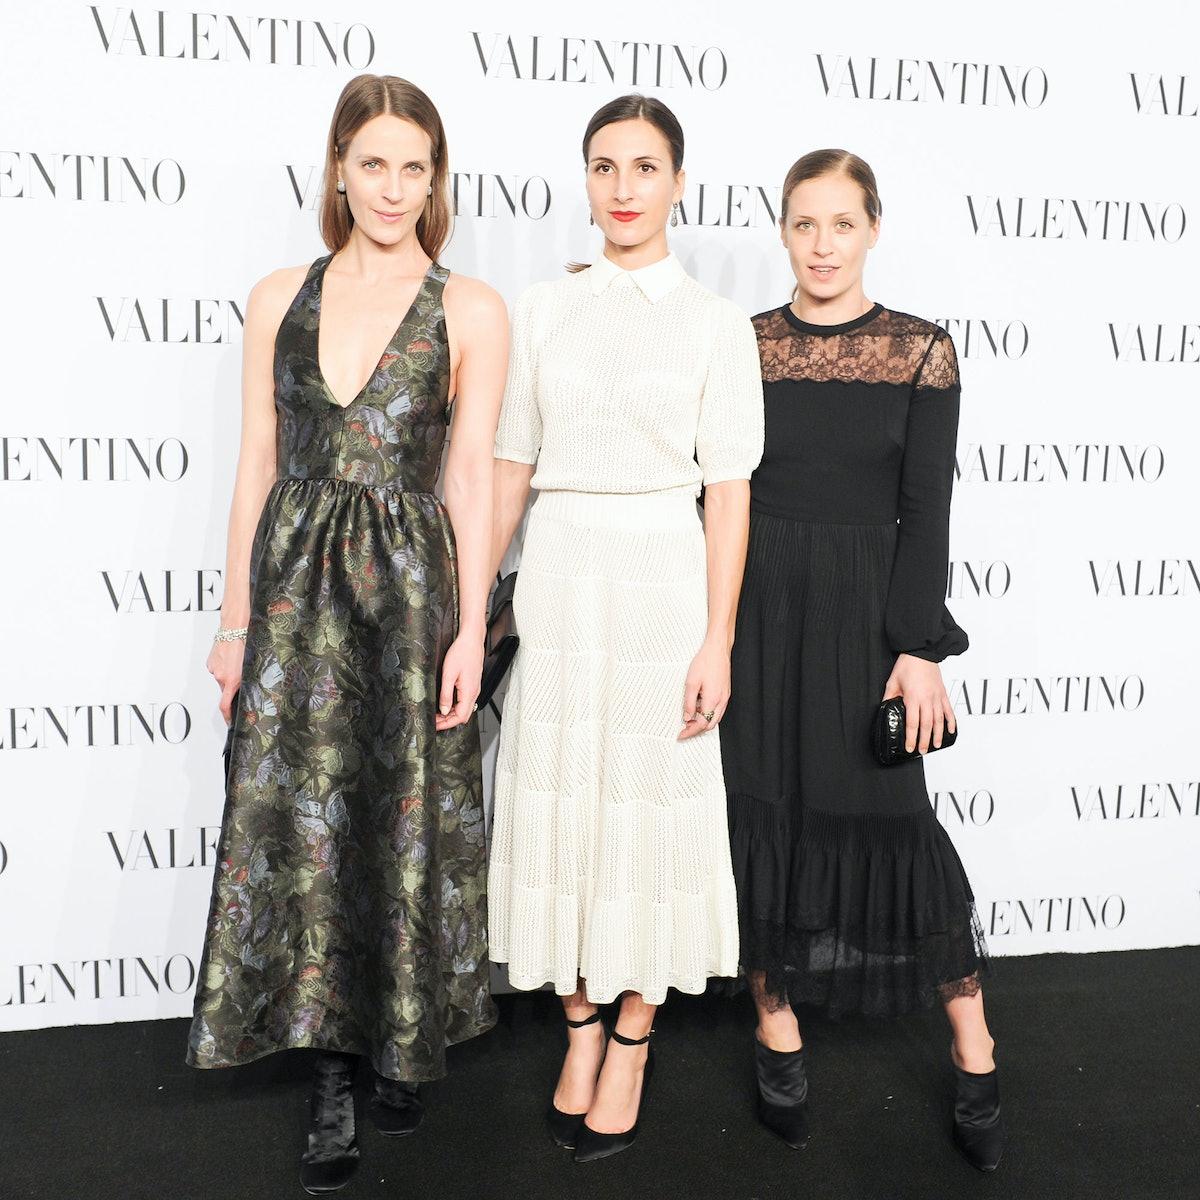 Vanessa Traina Snow, Samantha Traina, and Victoria Traina